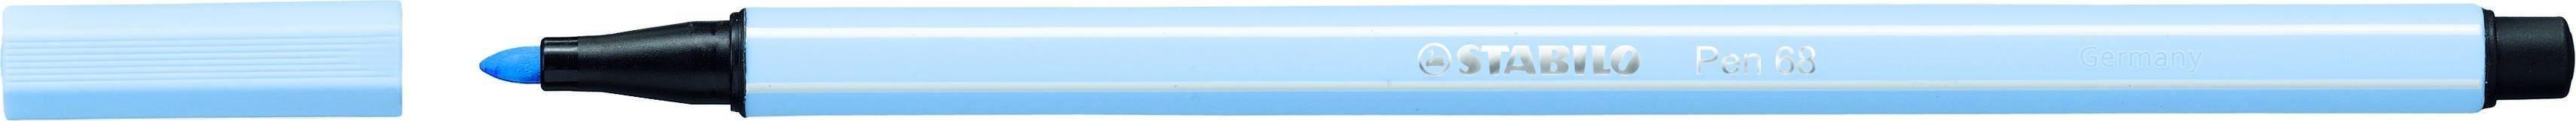 STABILO Pen 68 - feutre  pointe moyenne - Cobalt clair